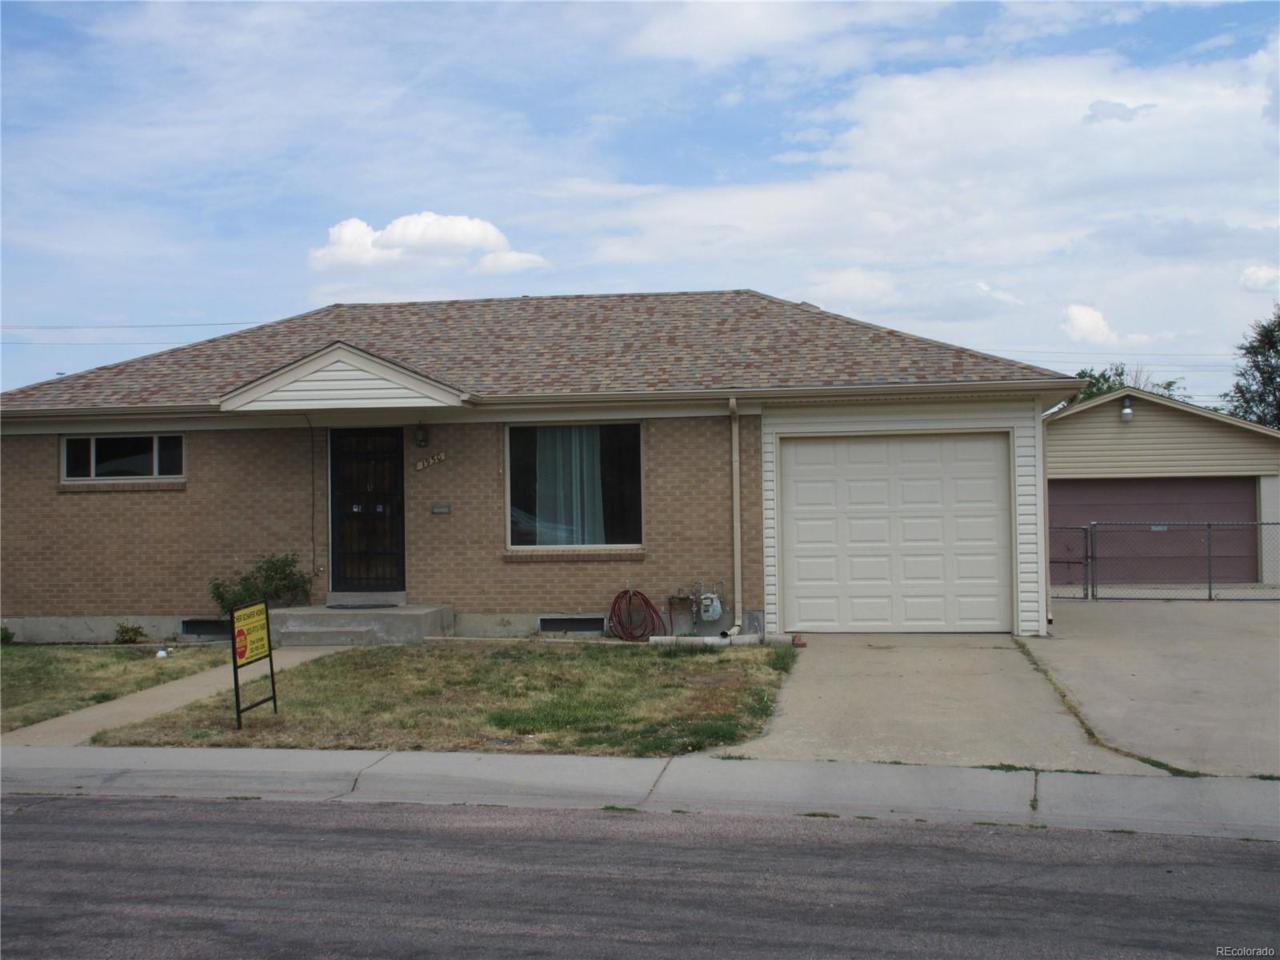 1950 W 73rd Place, Denver, CO 80221 (MLS #6865518) :: 8z Real Estate